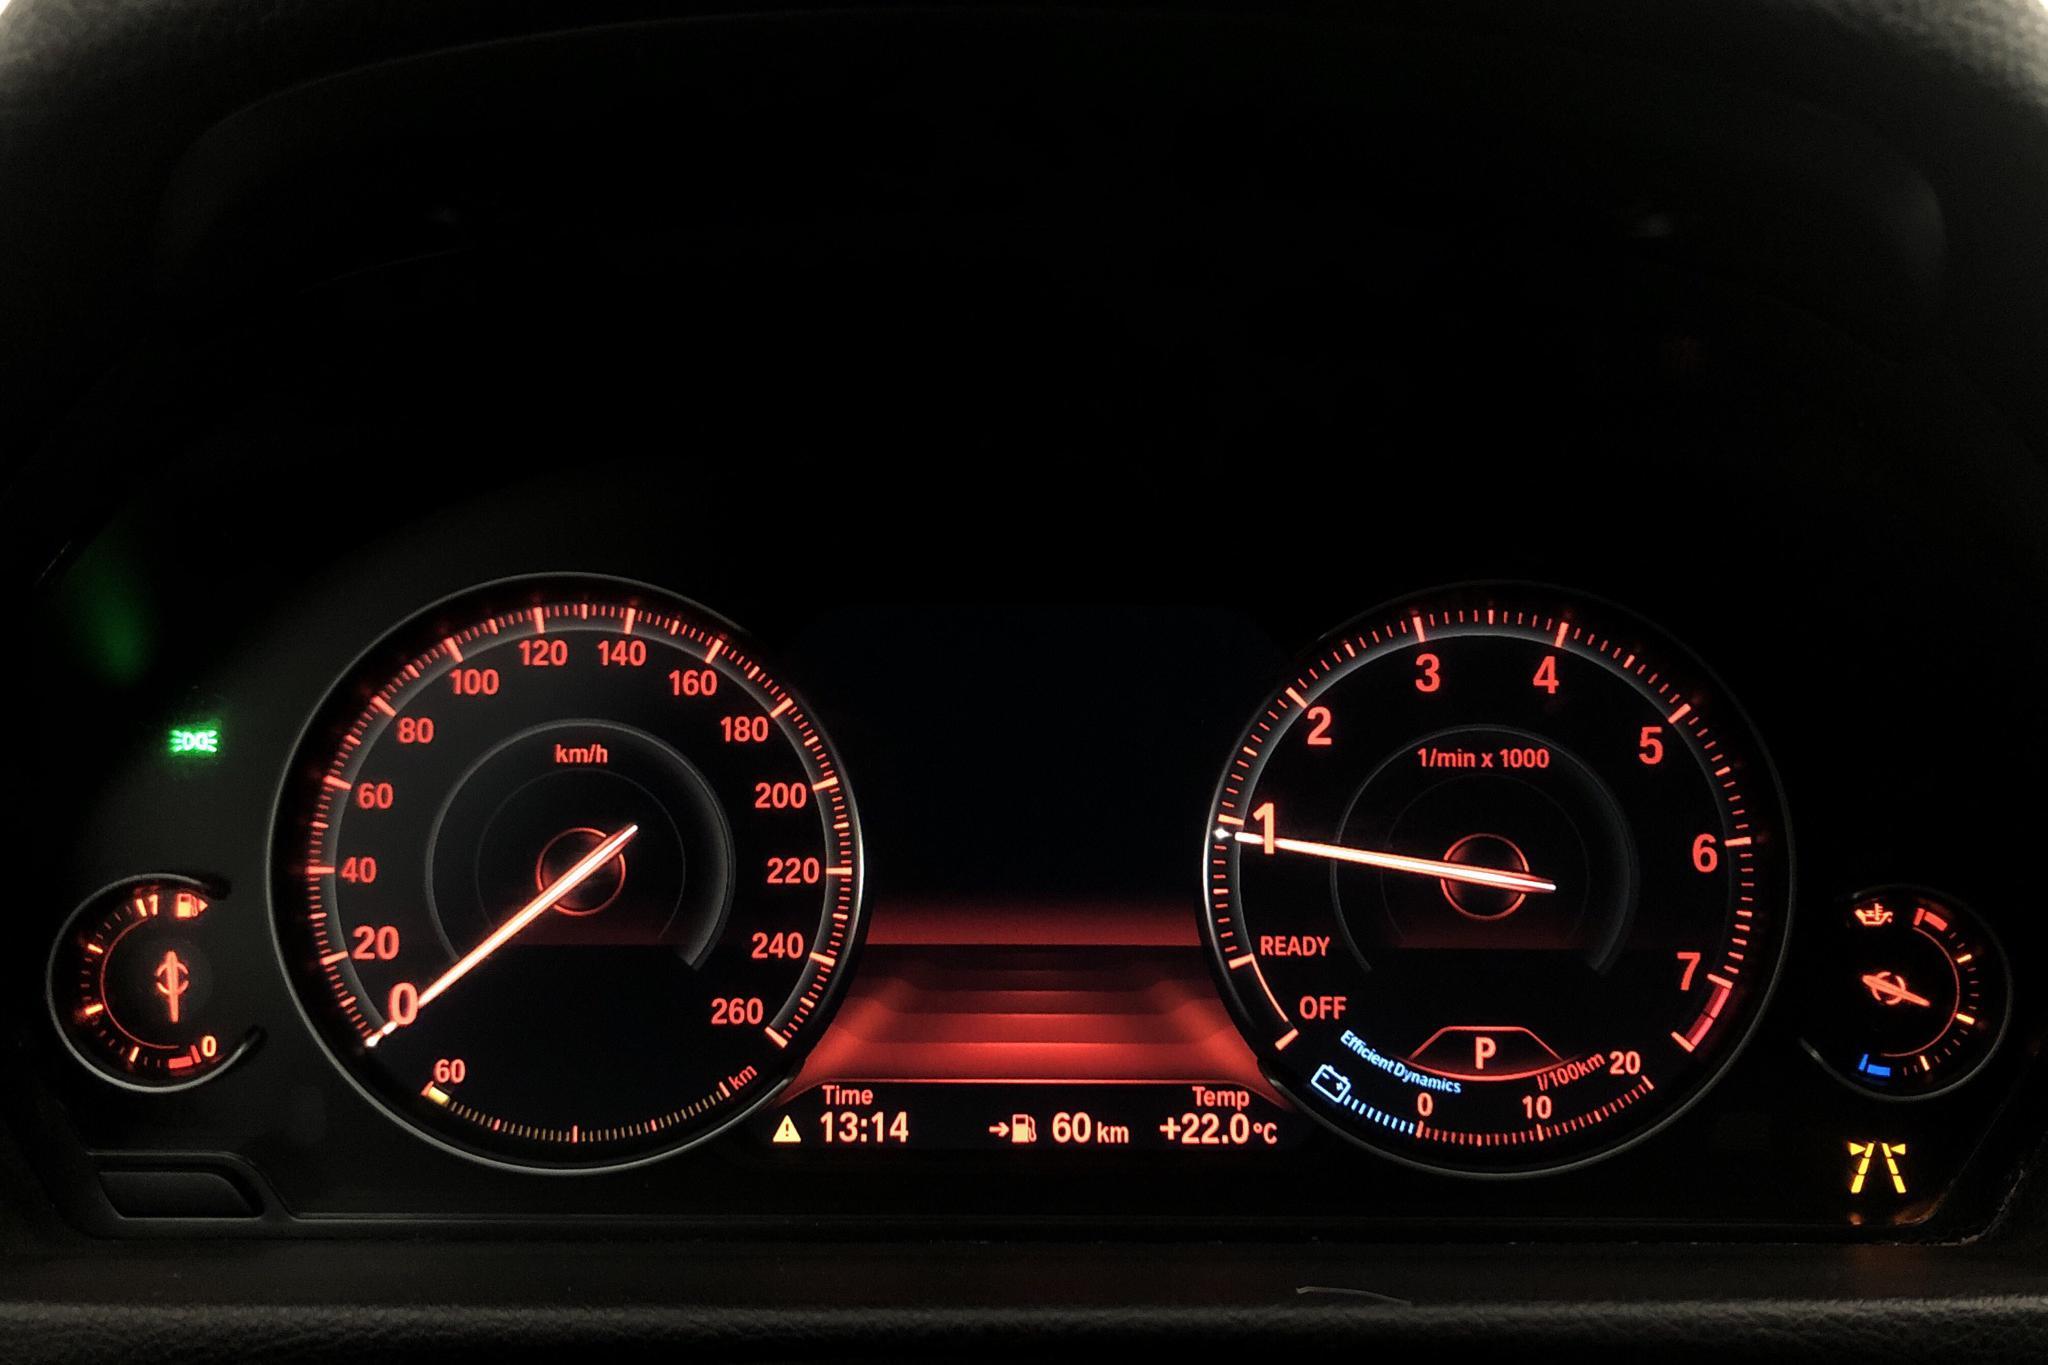 BMW 420i Gran Coupé, F36 (184hk) - 38 530 km - Automatic - blue - 2019